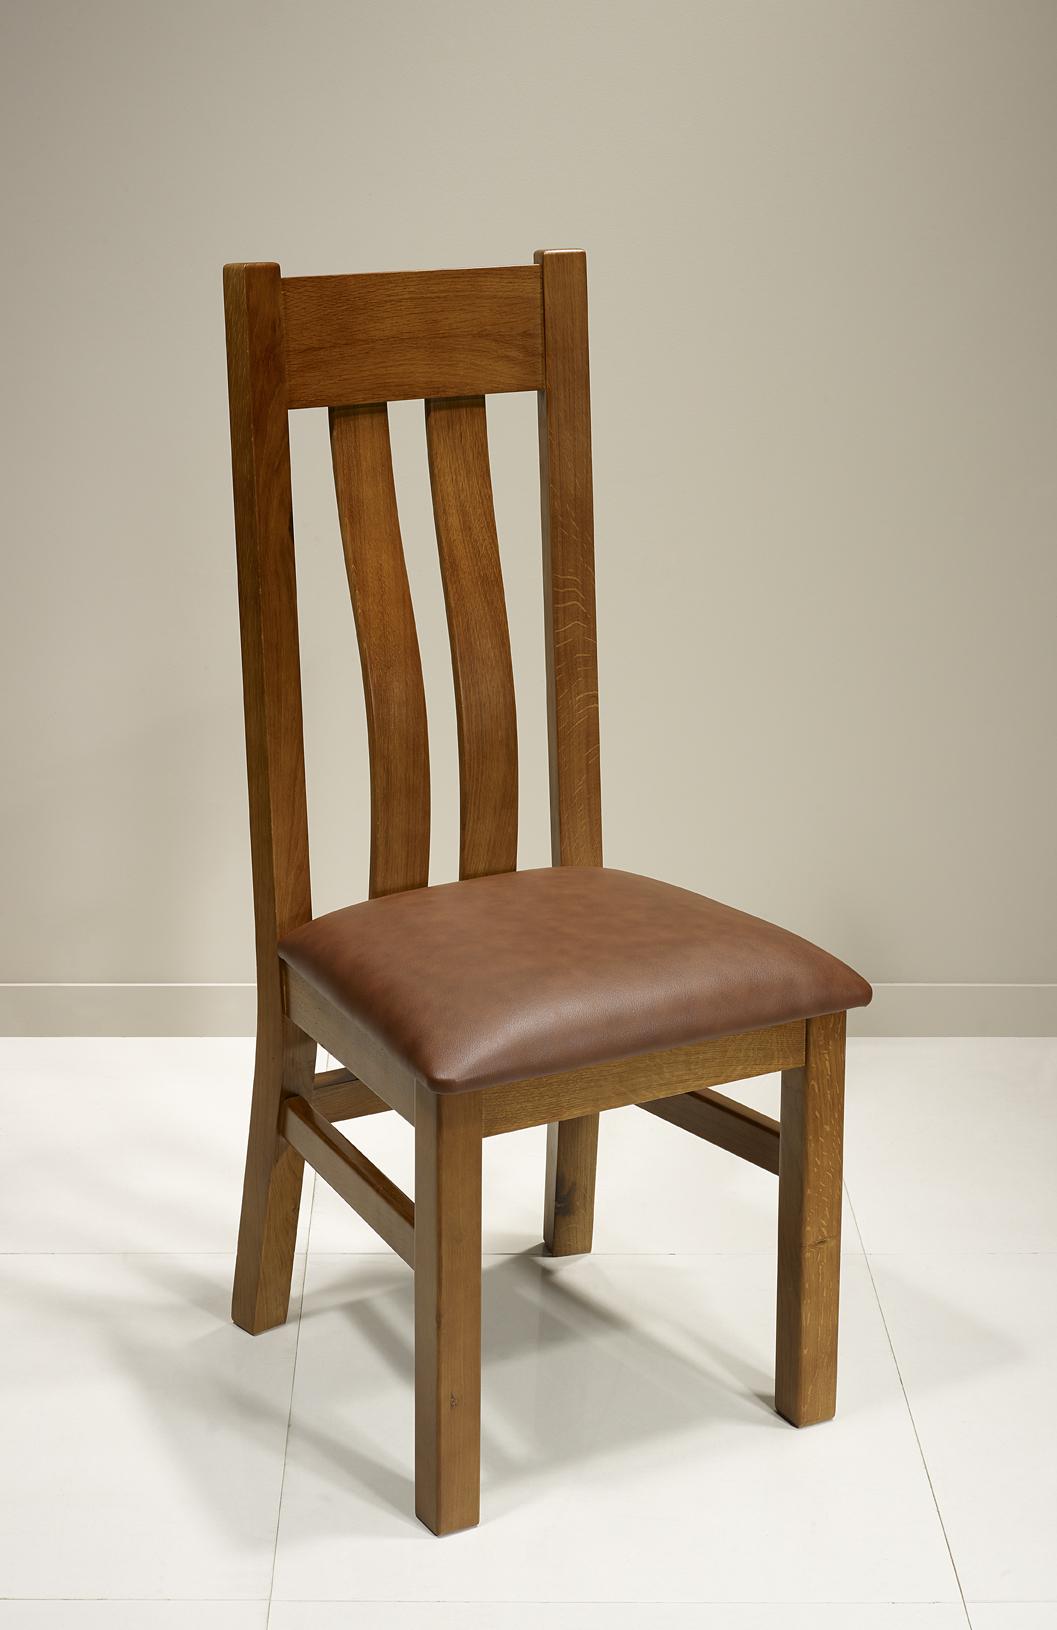 chaise l onor en ch ne massif assise moleskine havana meuble en ch ne massif. Black Bedroom Furniture Sets. Home Design Ideas